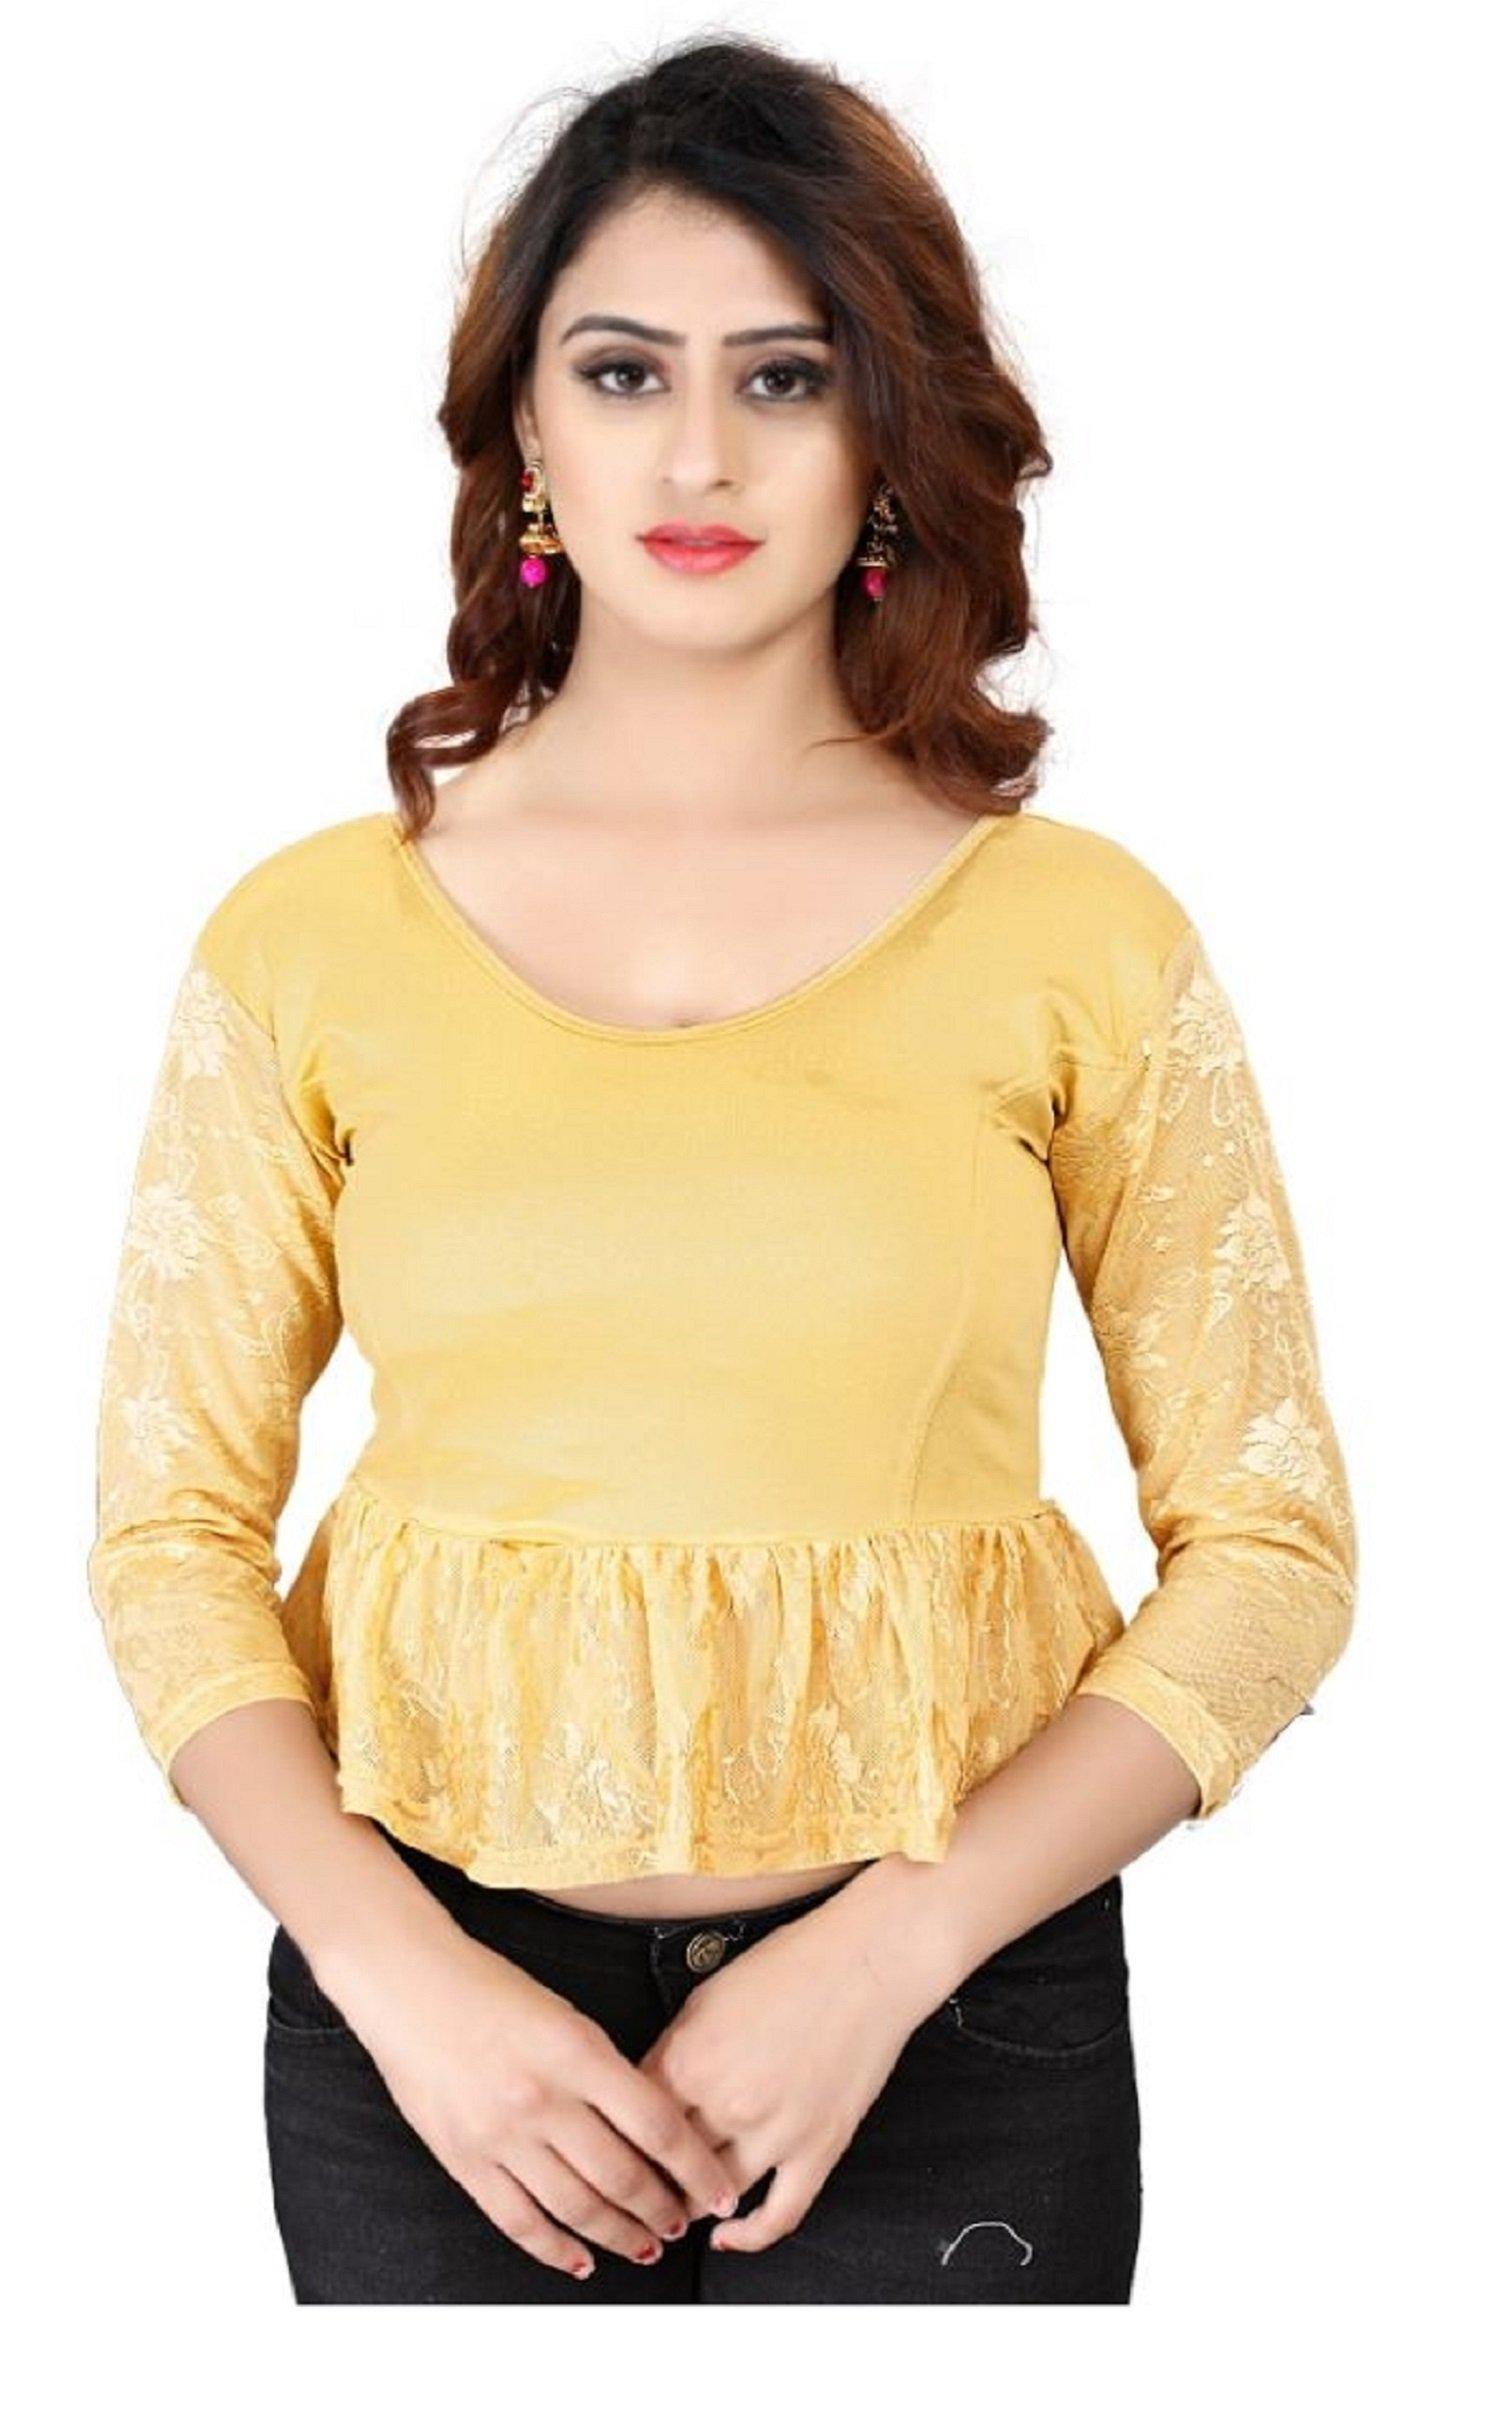 Fressia Fabrics Women's Stretchable Readymade Saree Blouse Crop Top Choli 171_GOLD